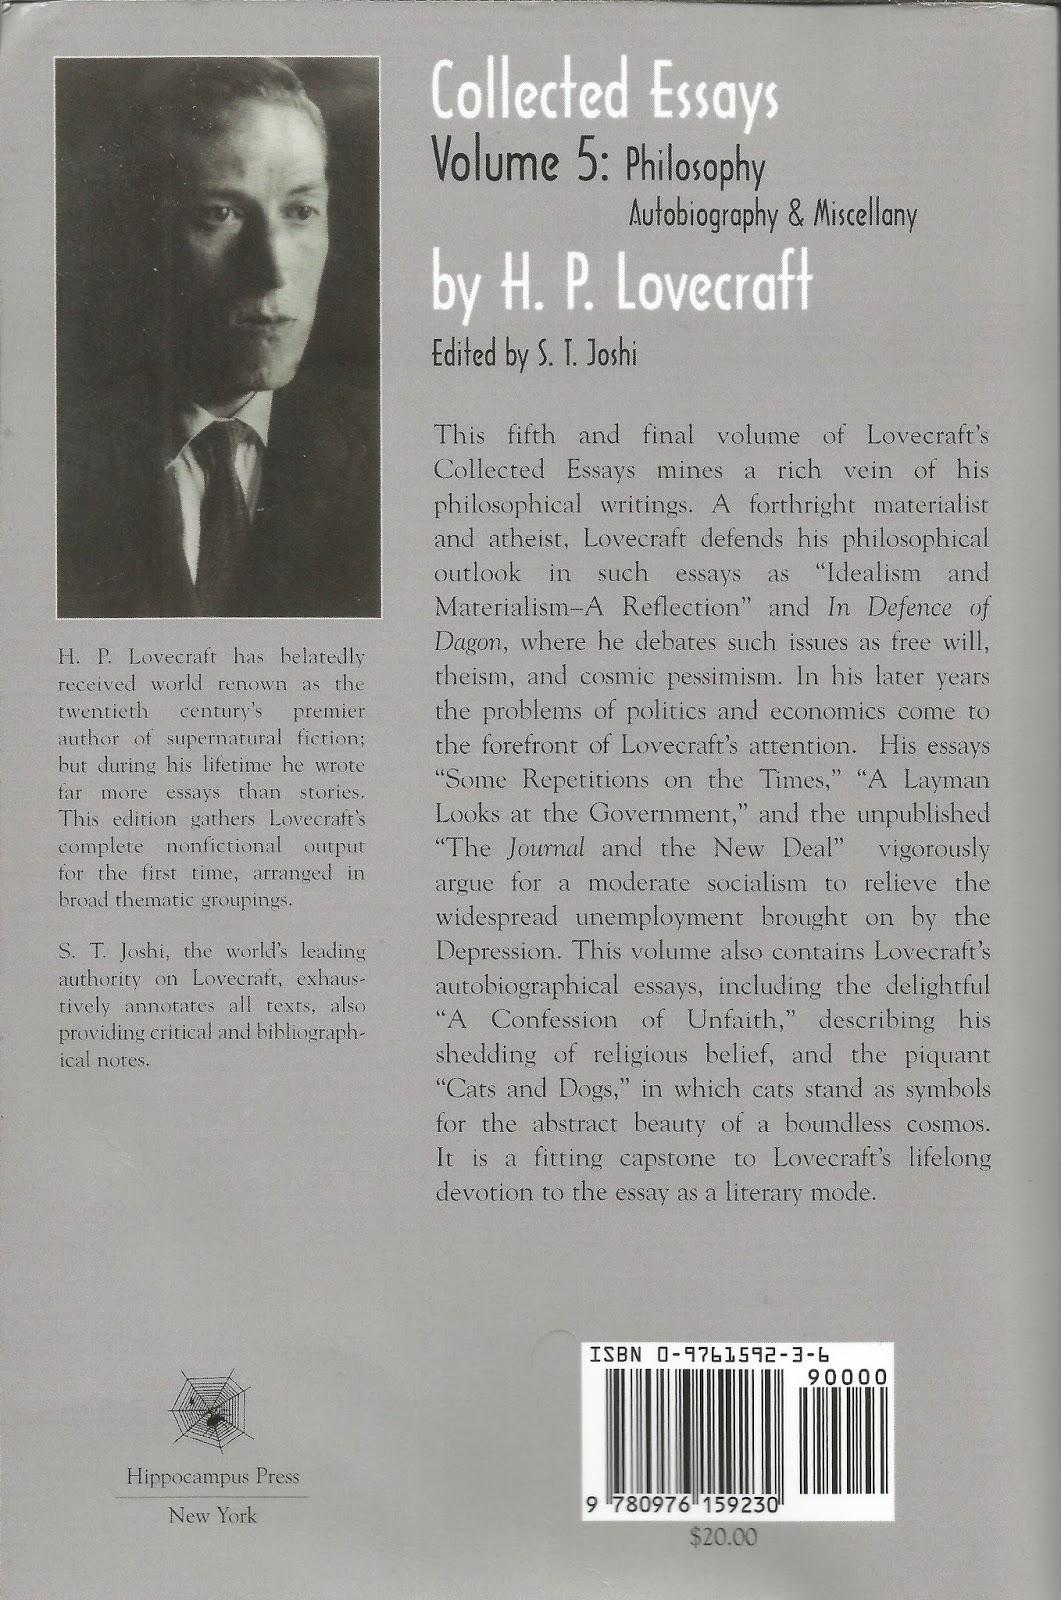 H.P. Lovecraft's Weird Body